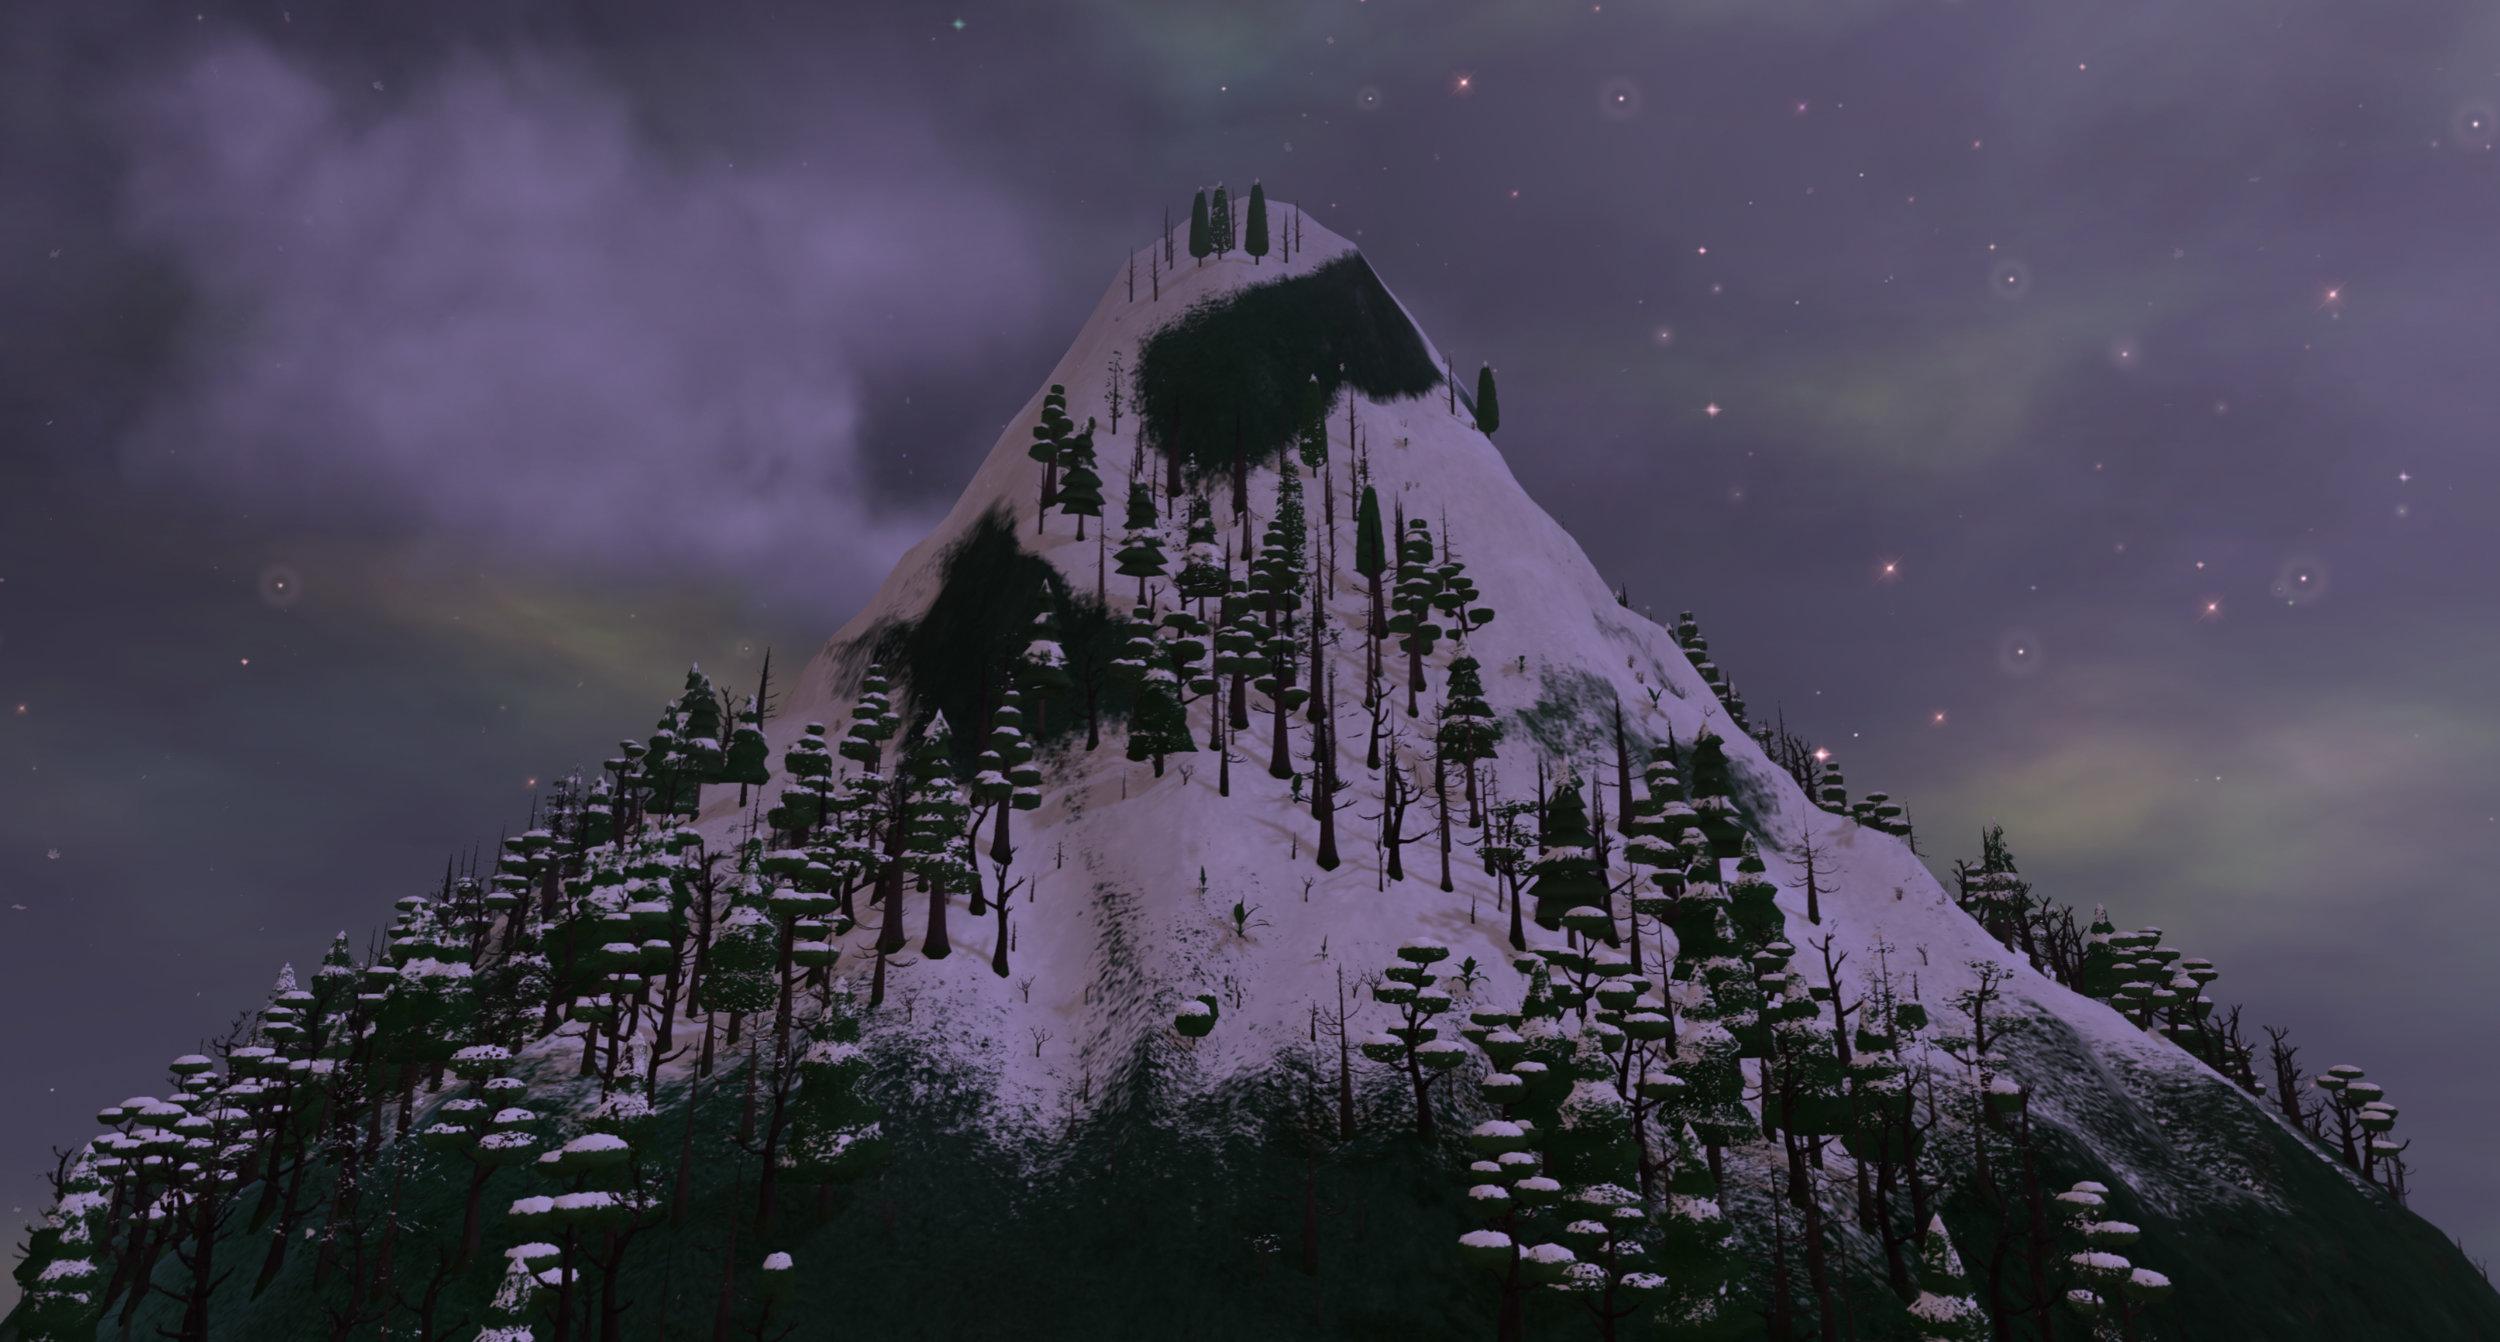 Mountain2_02_©_David_OReilly_2018.jpg